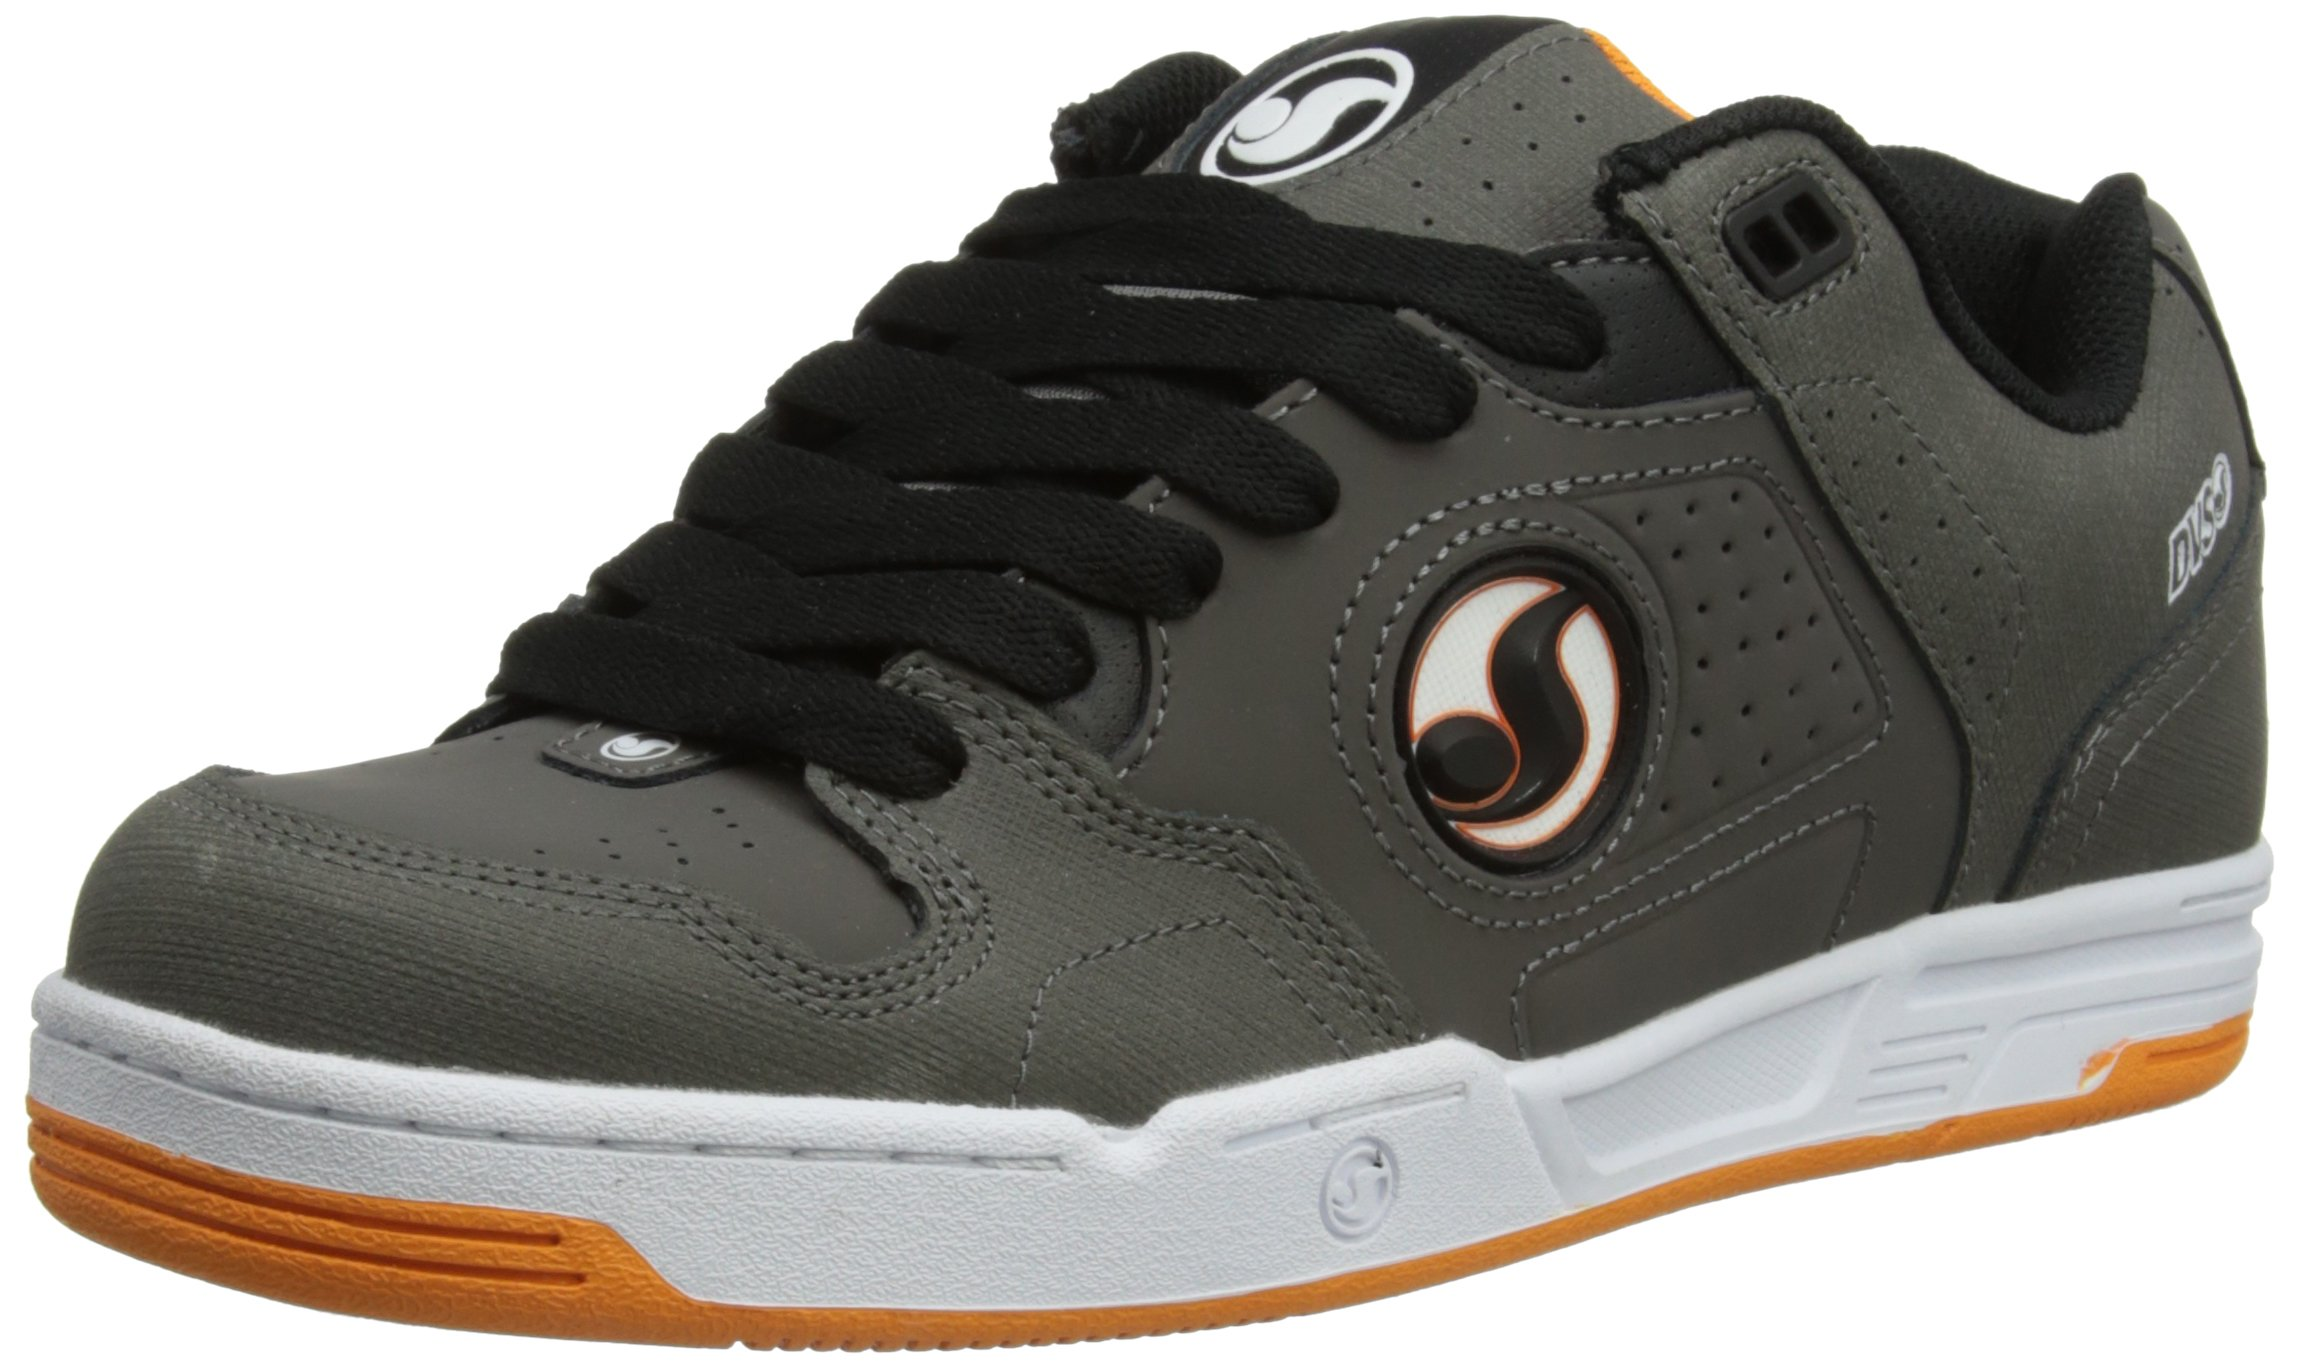 DVS Havoc Skate Shoe,Grey Leather,8 M US